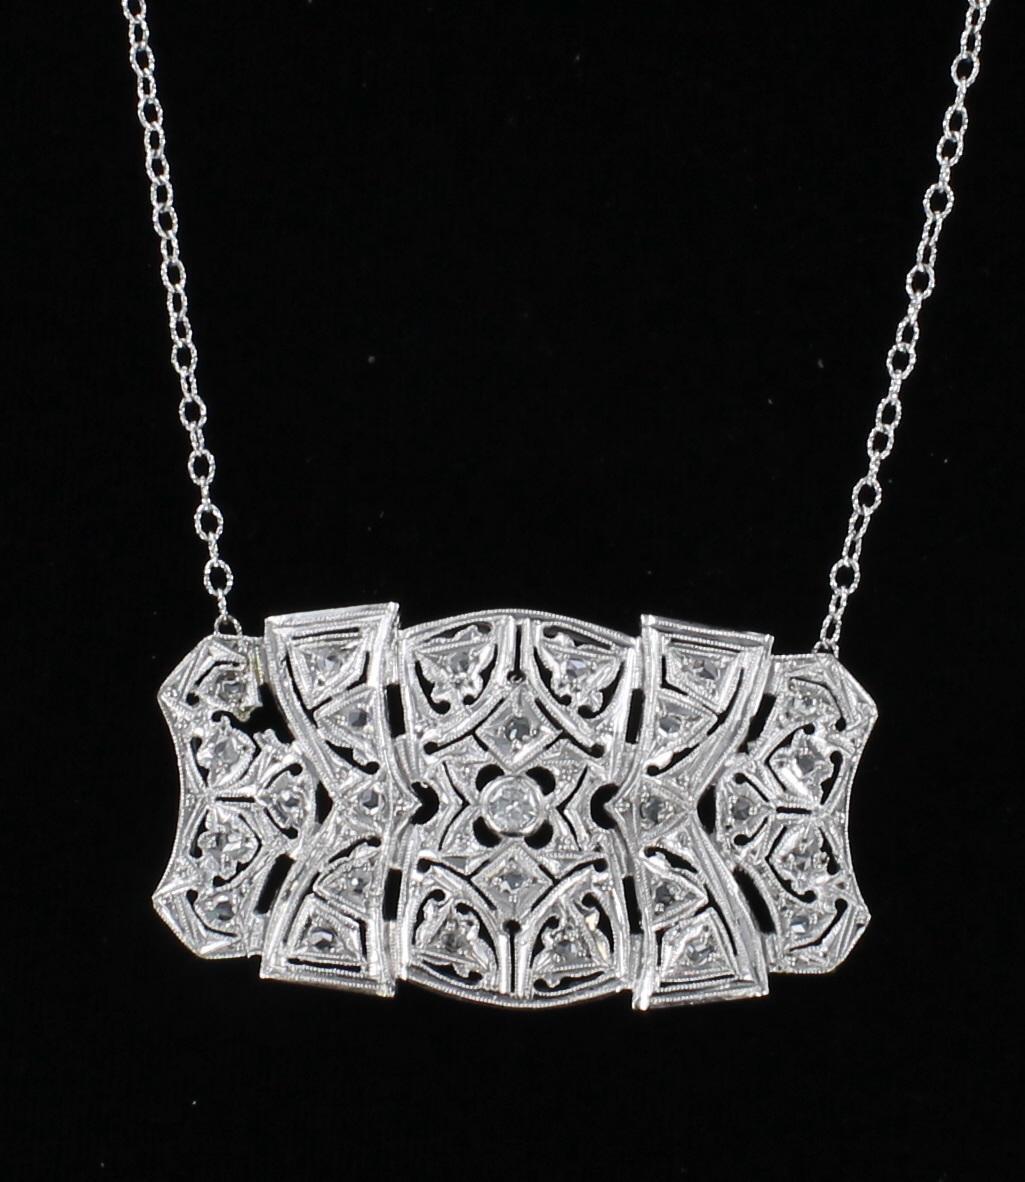 18KT ART DECO DIAMOND NECKLACE 198-23751